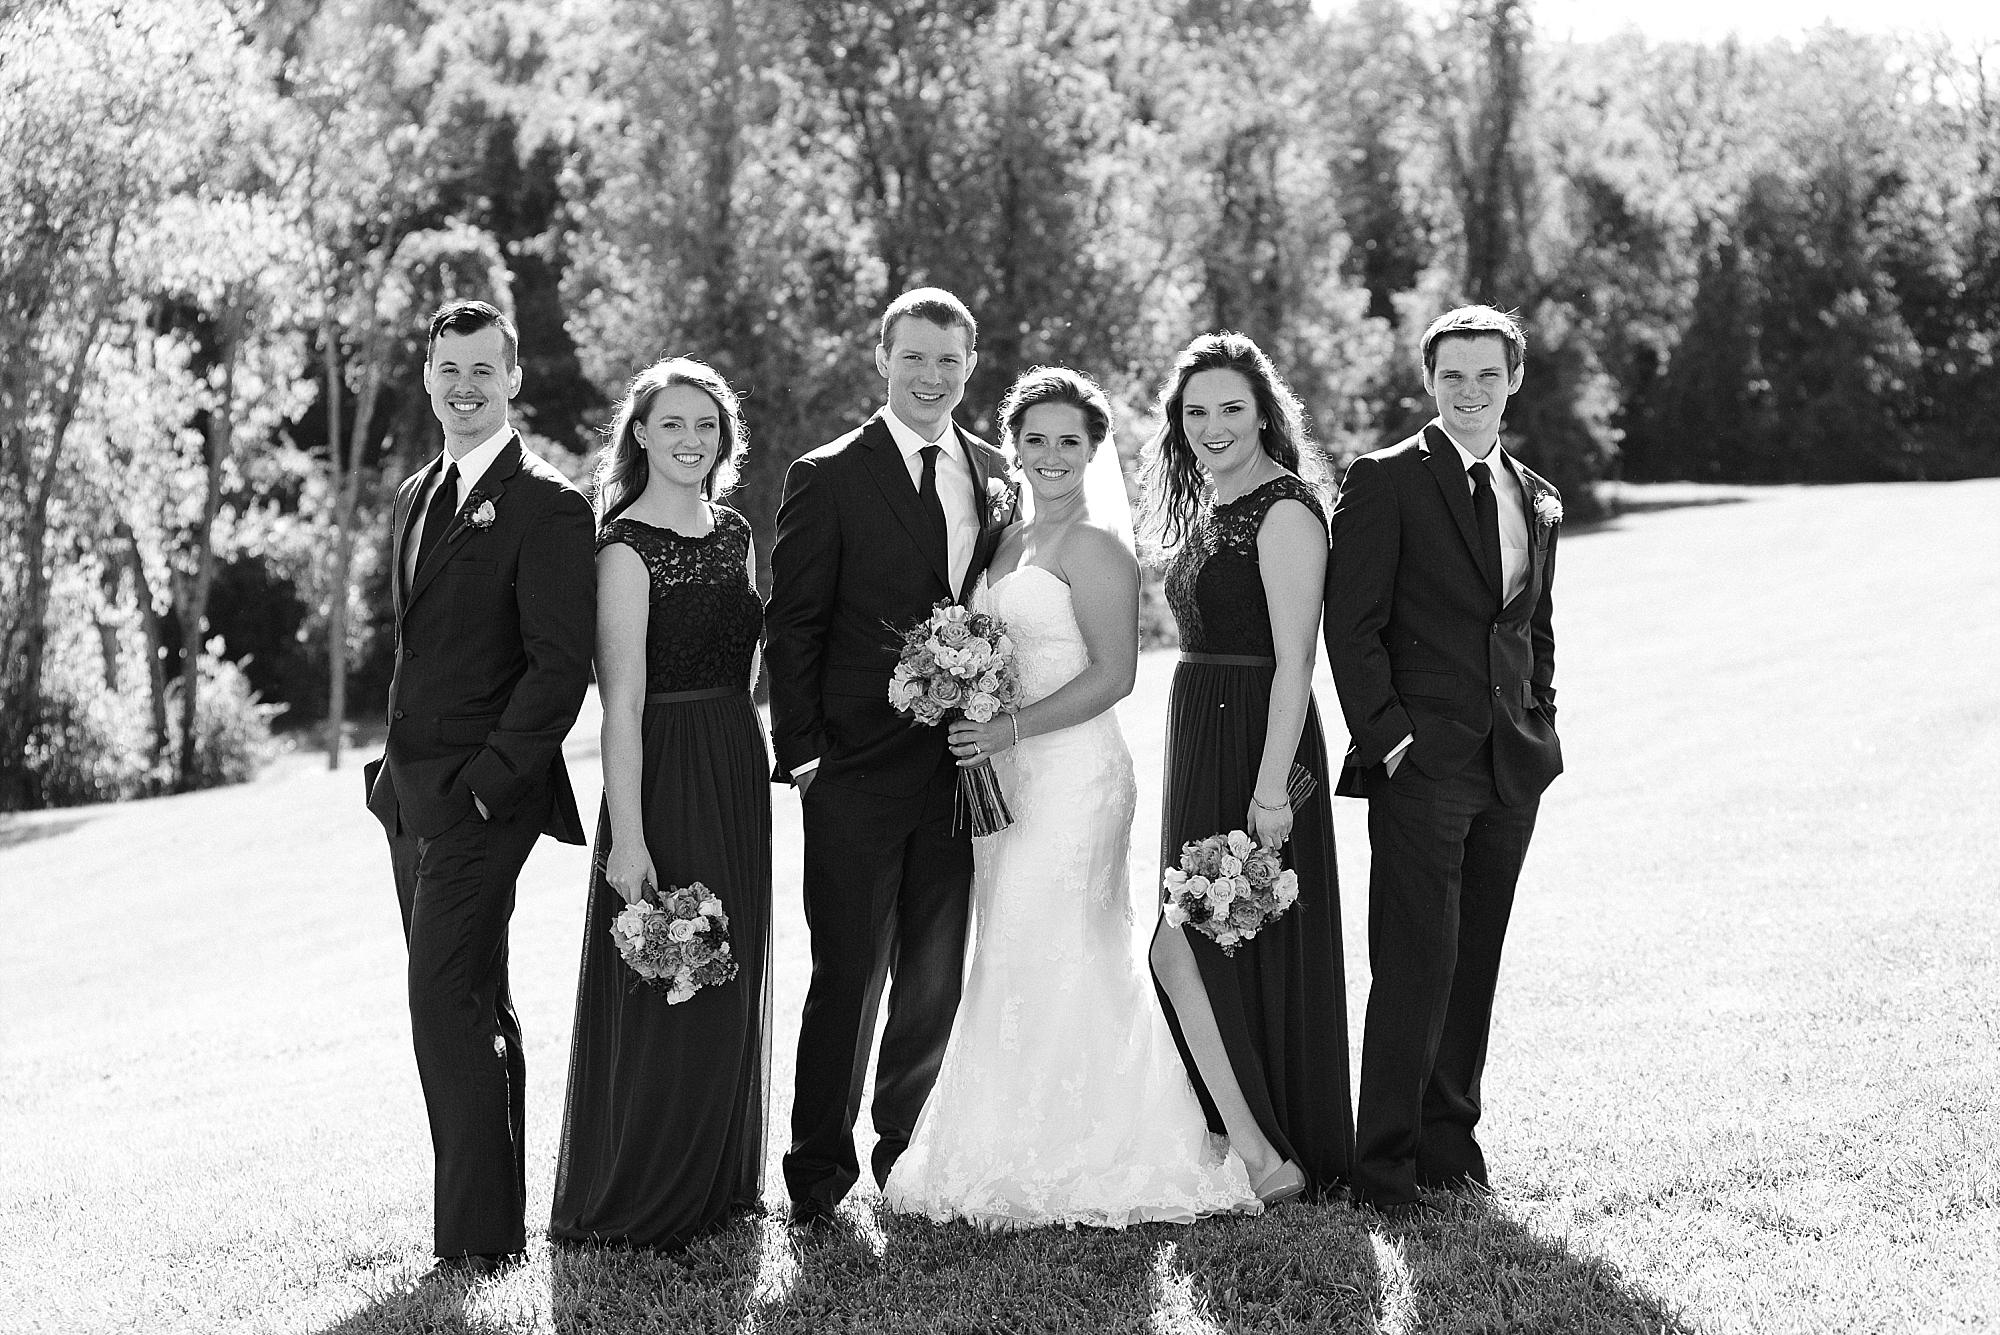 wedding-party-photo-ideas